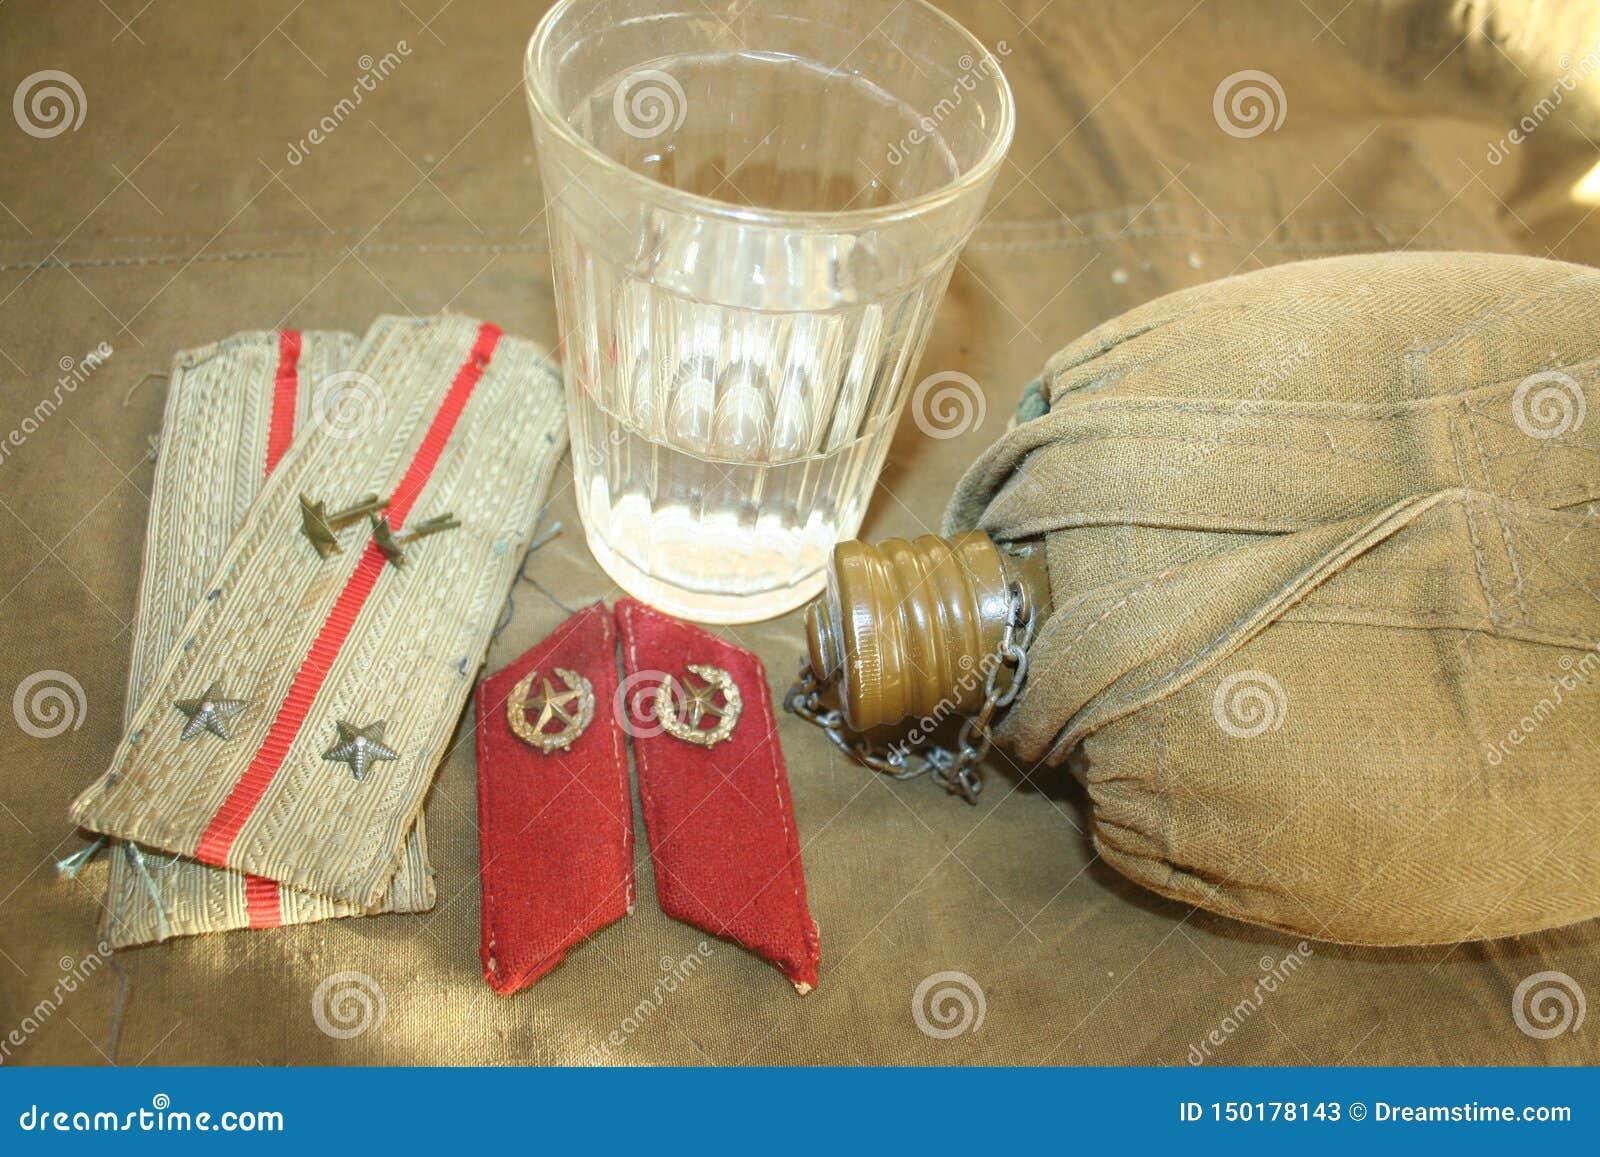 Наградил лейтенанту пехоты ряд старшего лейтенанта